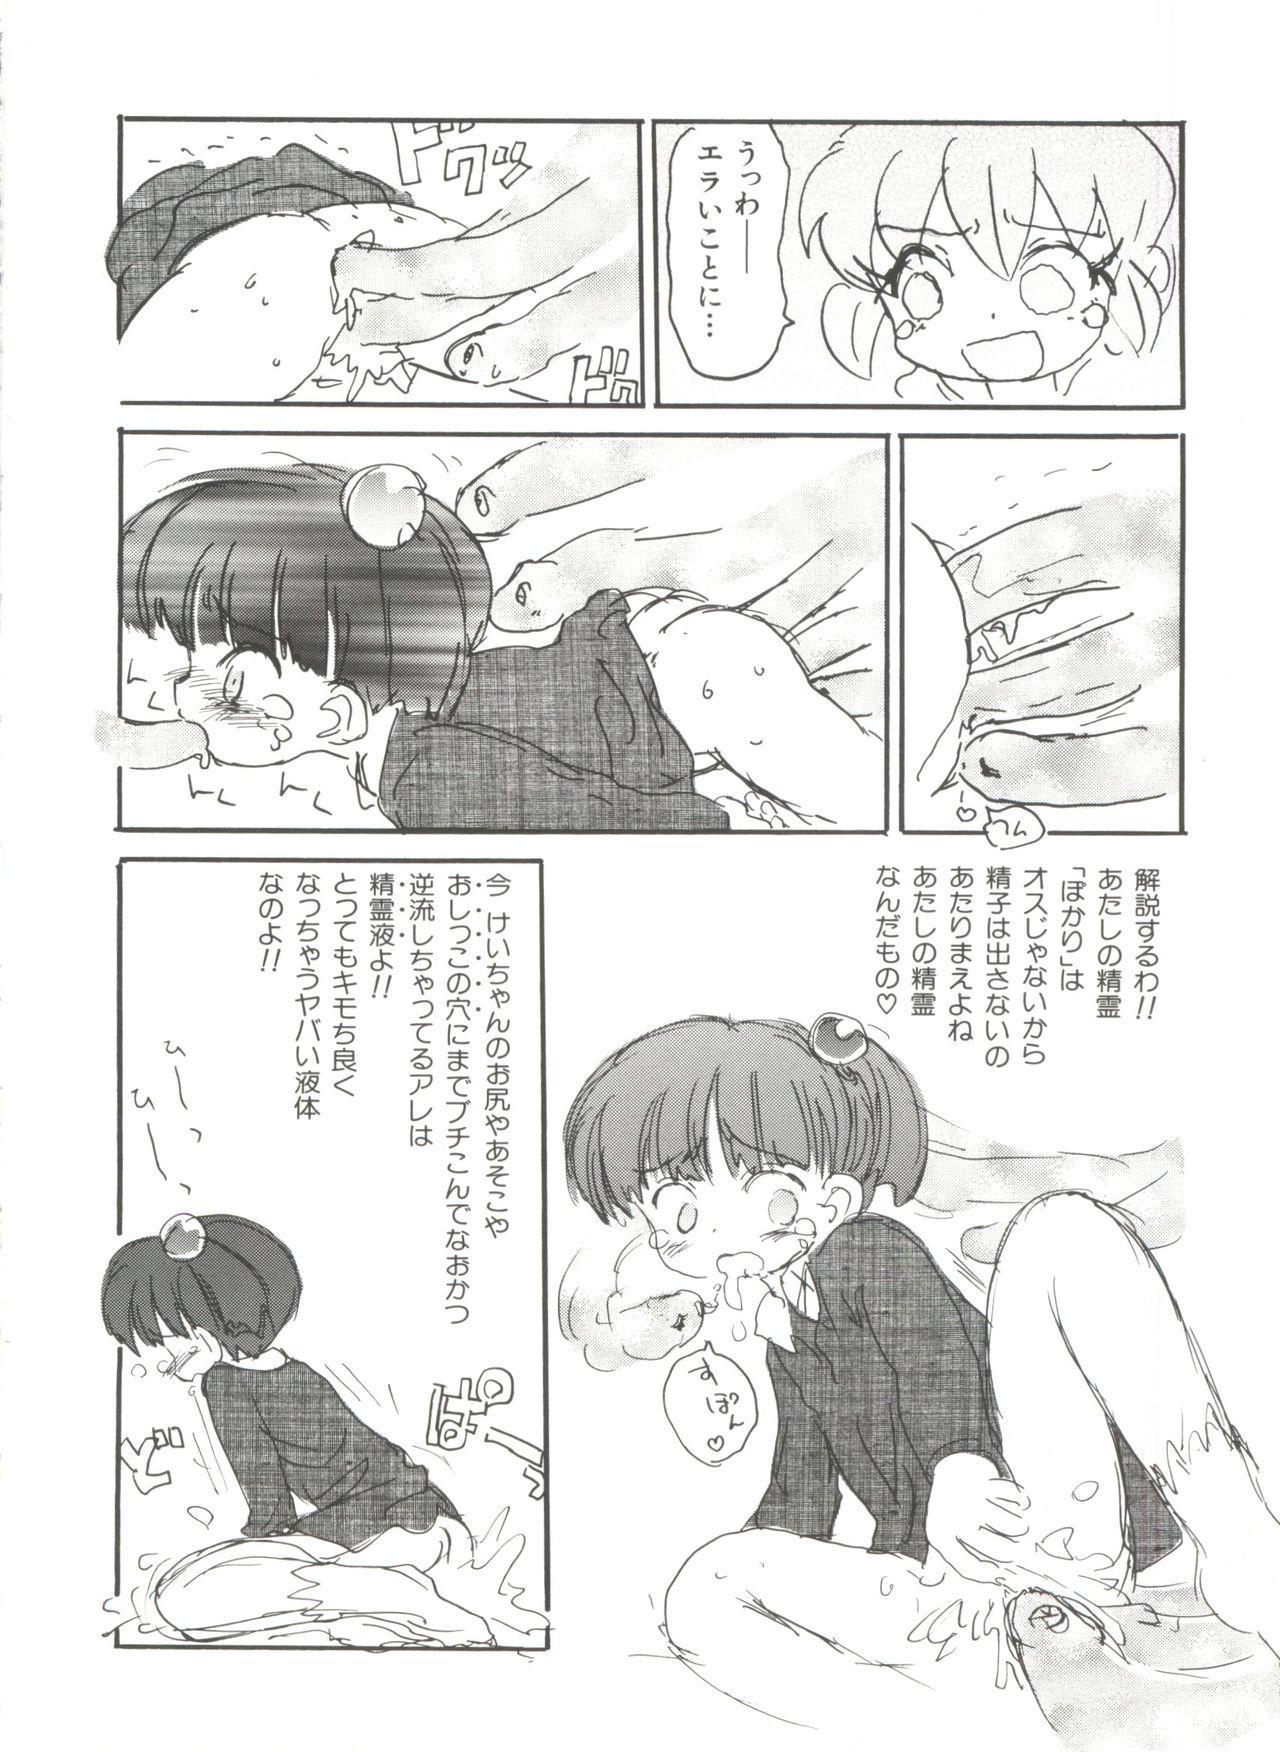 [Anthology] Denei Tamatebako 8 - Utakata no Tenshi-tachi II (Various) 31